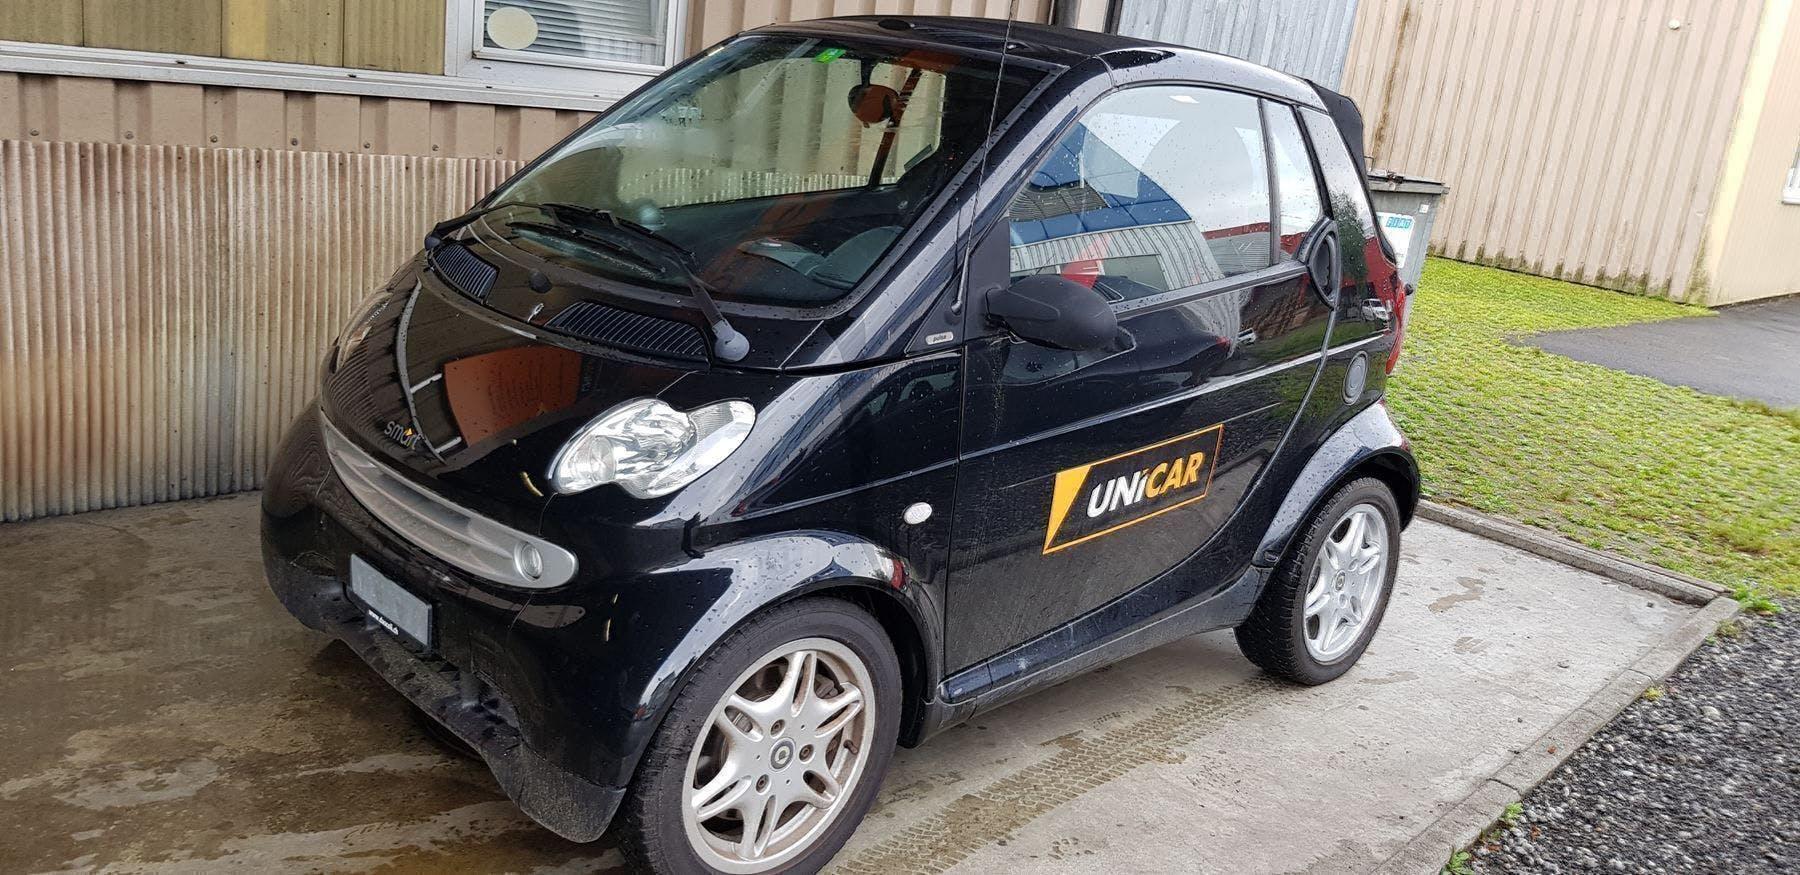 cabriolet Smart City/Fortwo City-Cabrio 600 61 Pulse